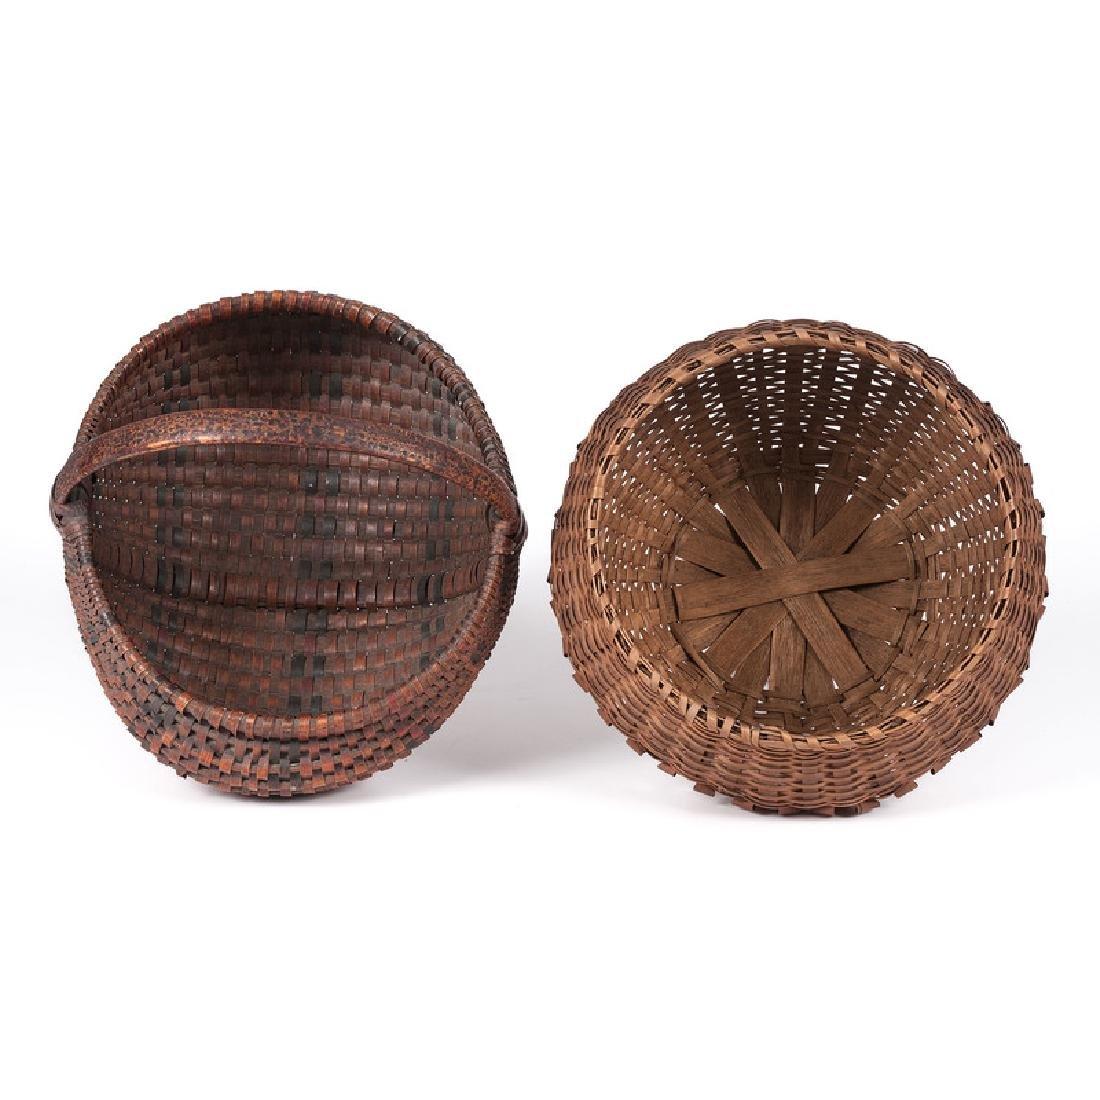 Woven Baskets - 3